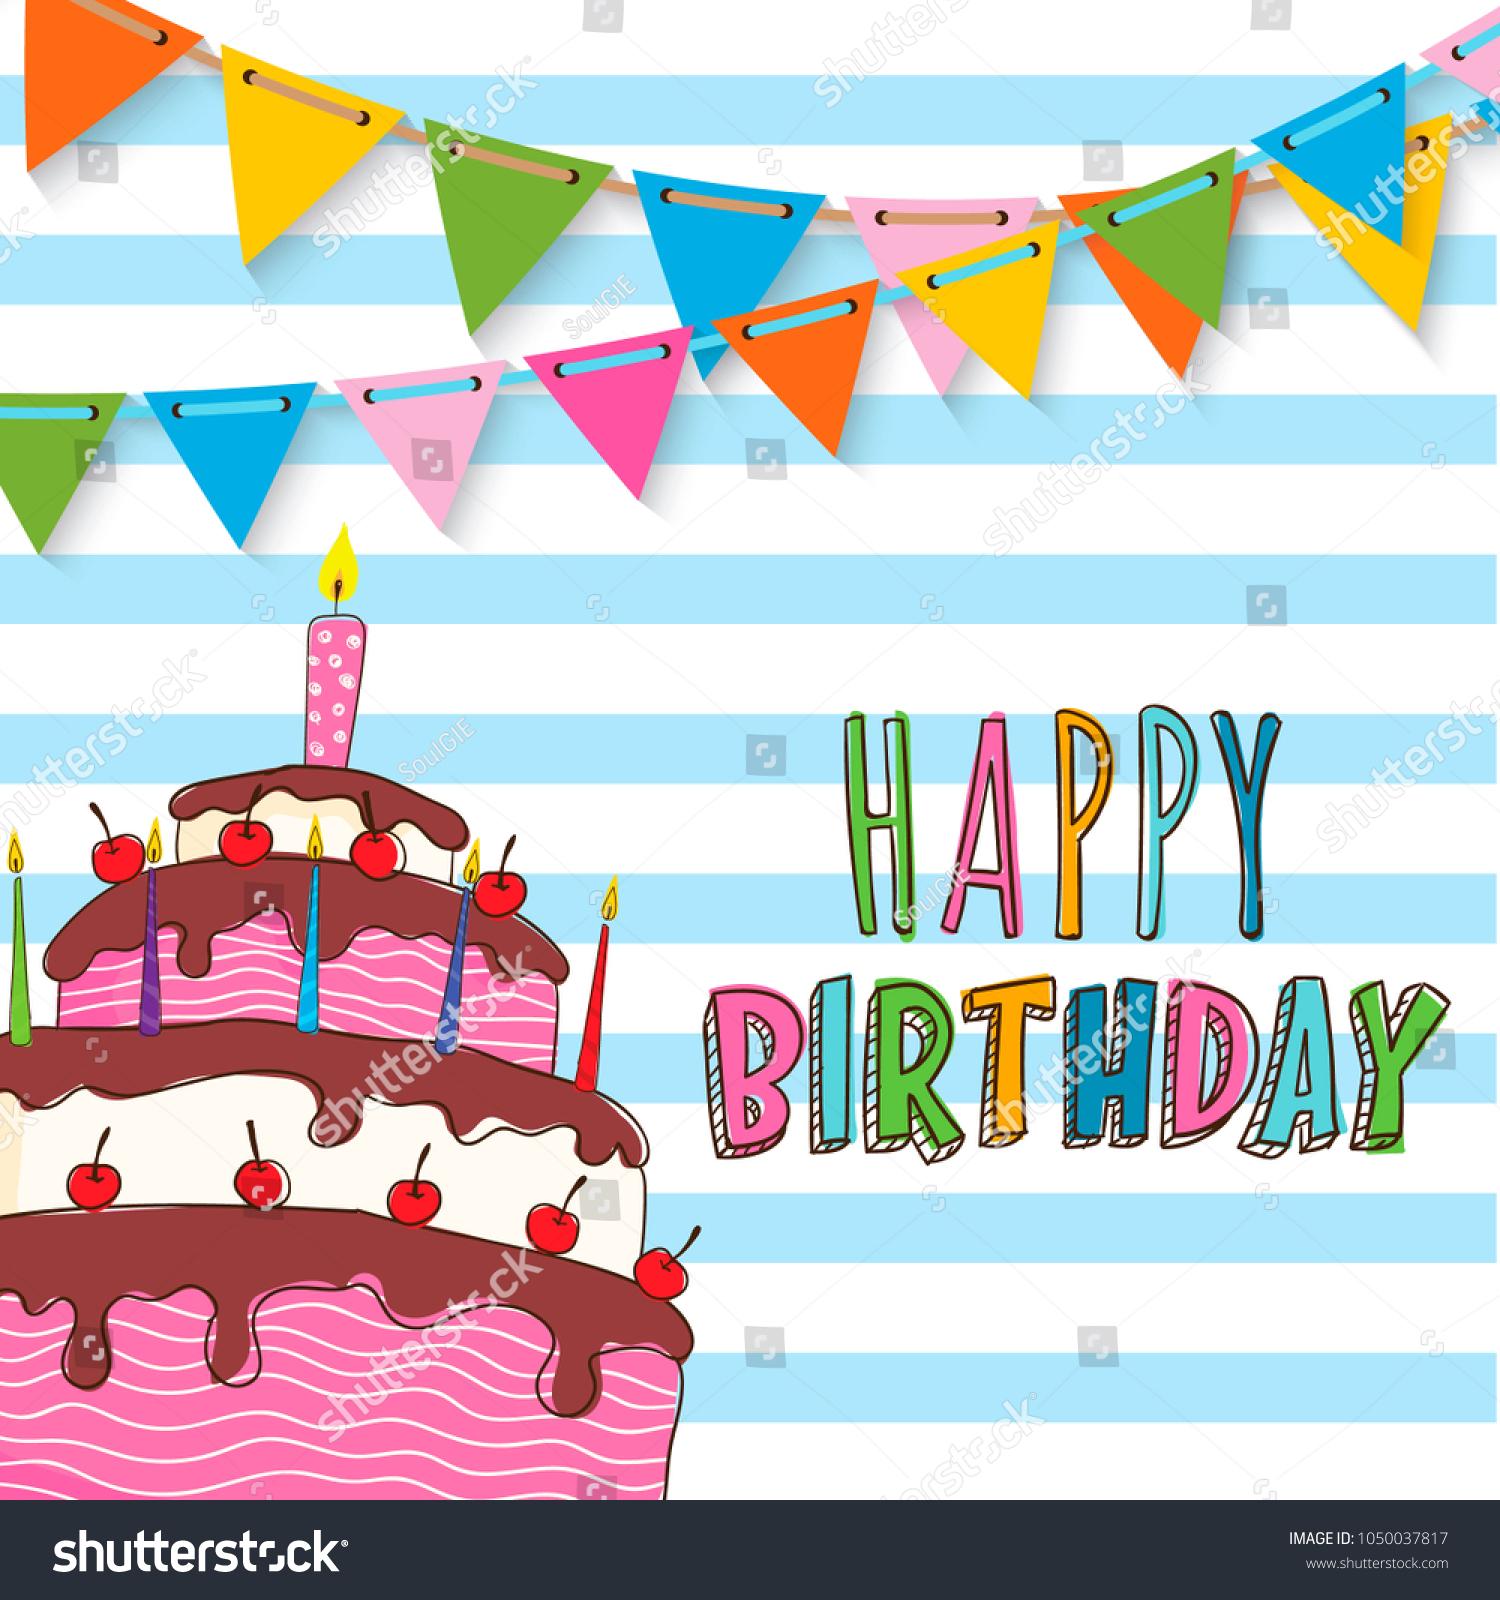 Happy Birthday Invitation Card Design Stock Vector 1050037817 ...